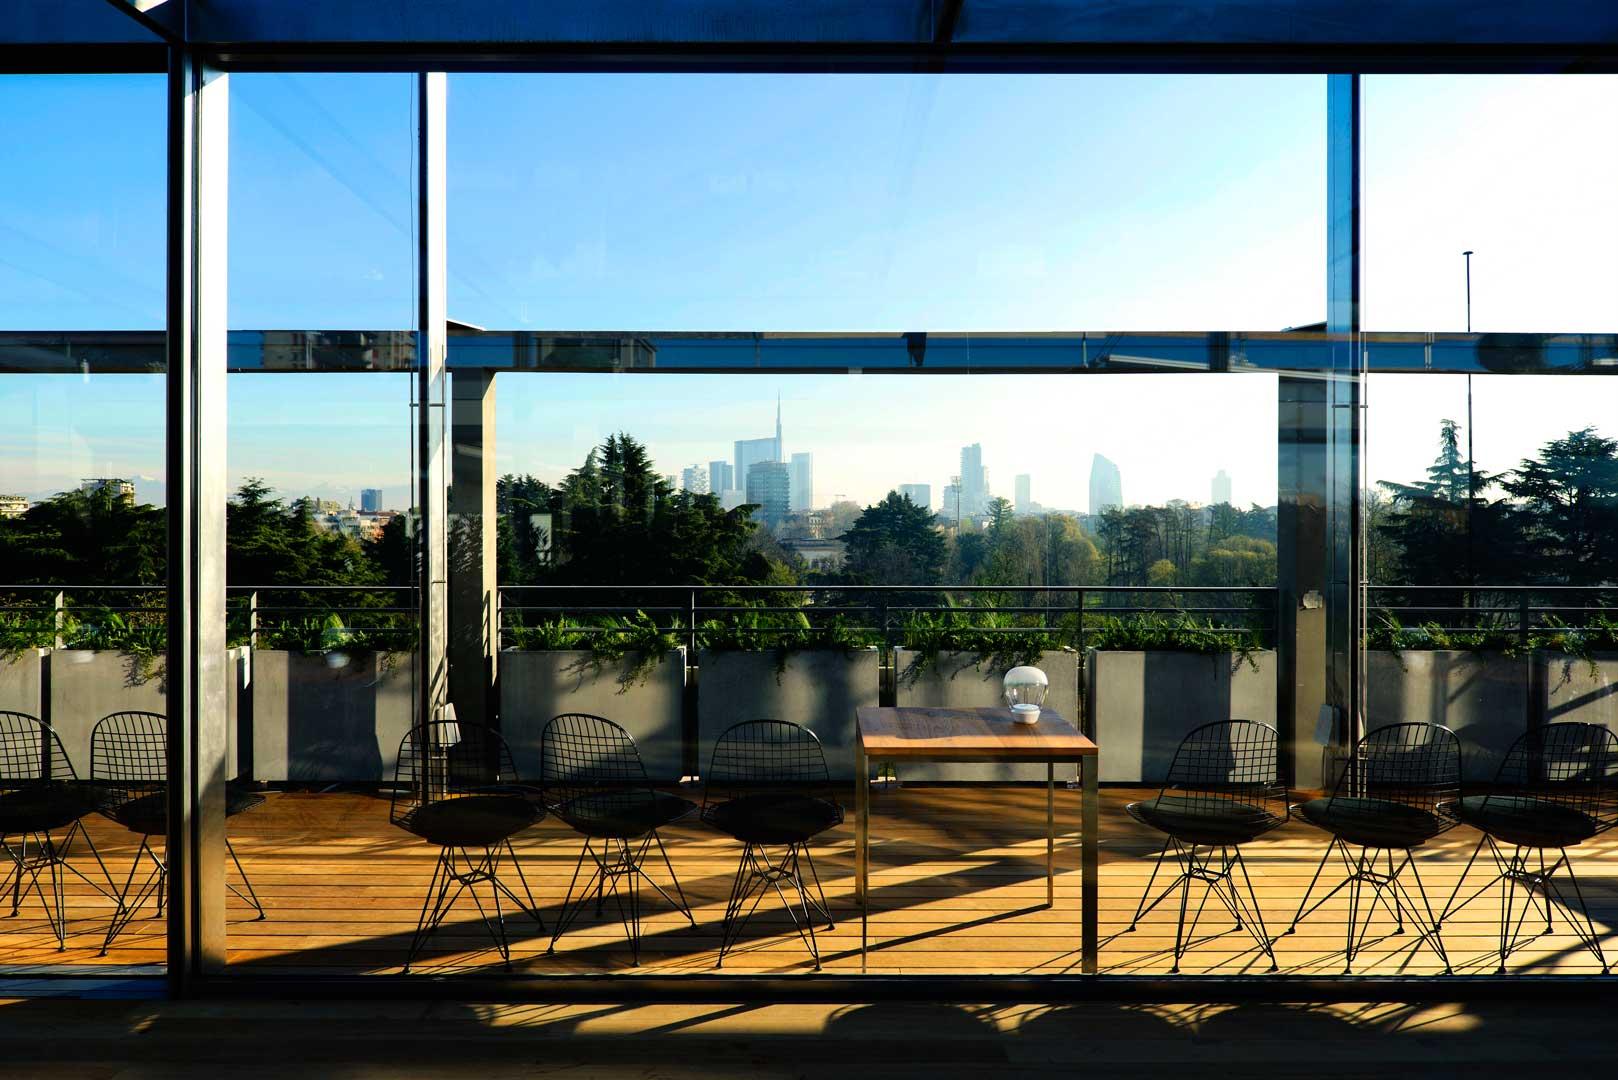 Milan\'s top 5 fascinating rooftops | Flawless Milano